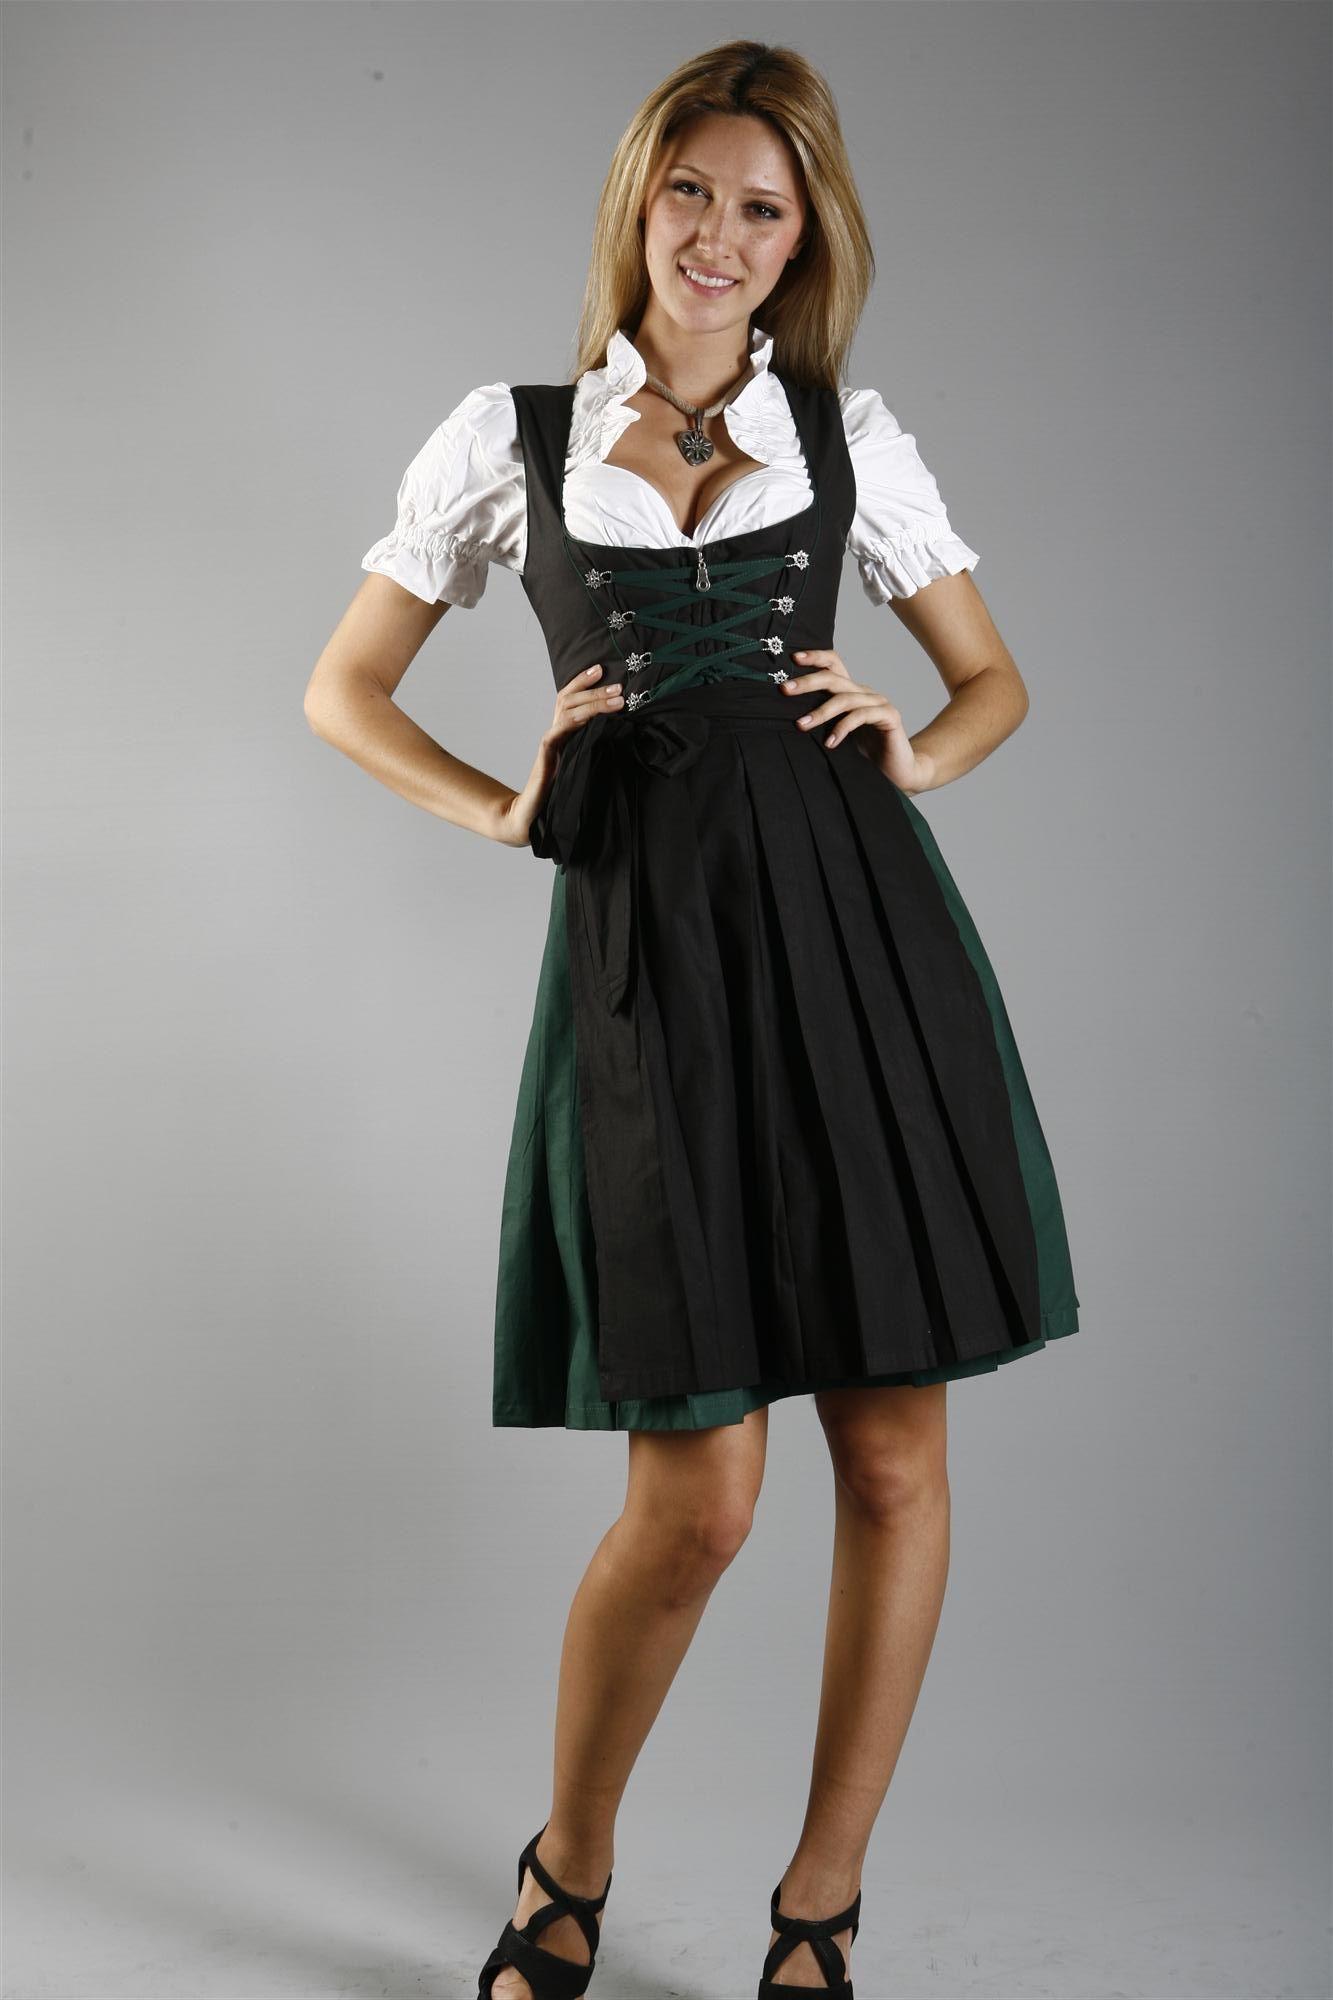 3-piece black dirndl with dark green skirt - Dirndl.com ... 0f5e6193c4